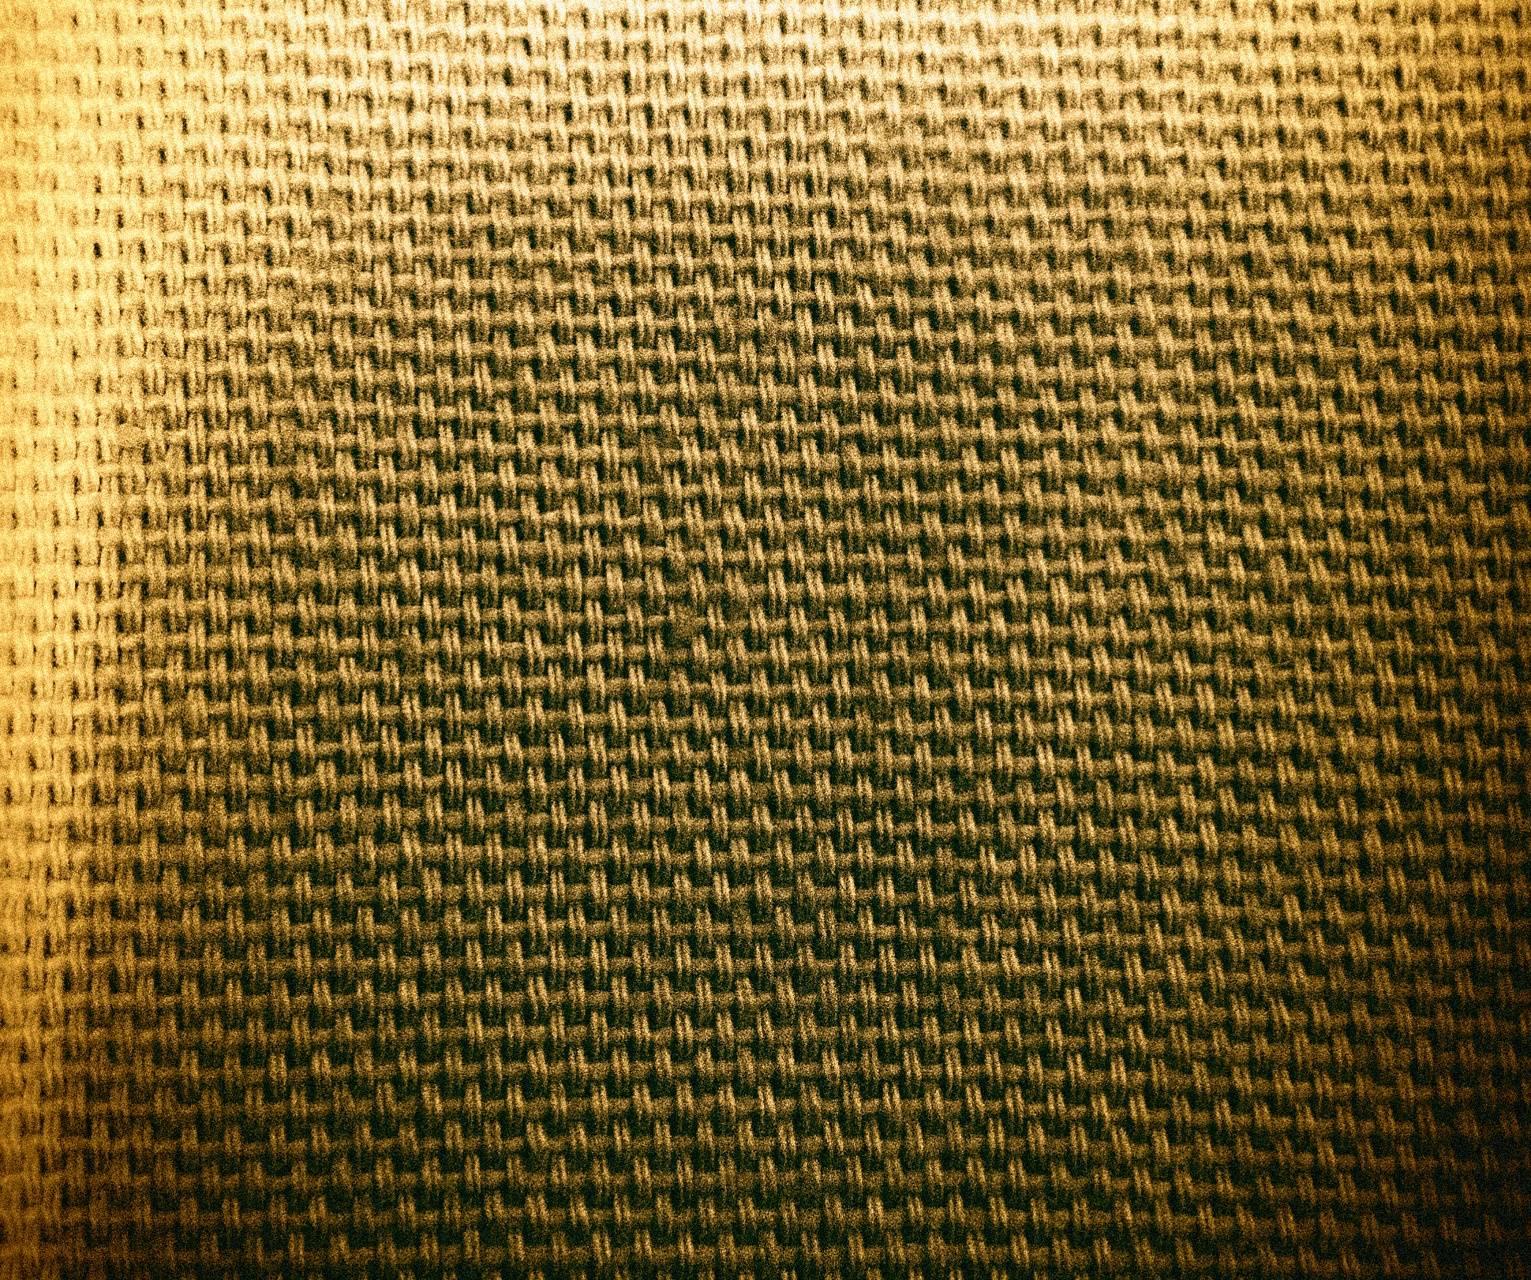 Brown Threads